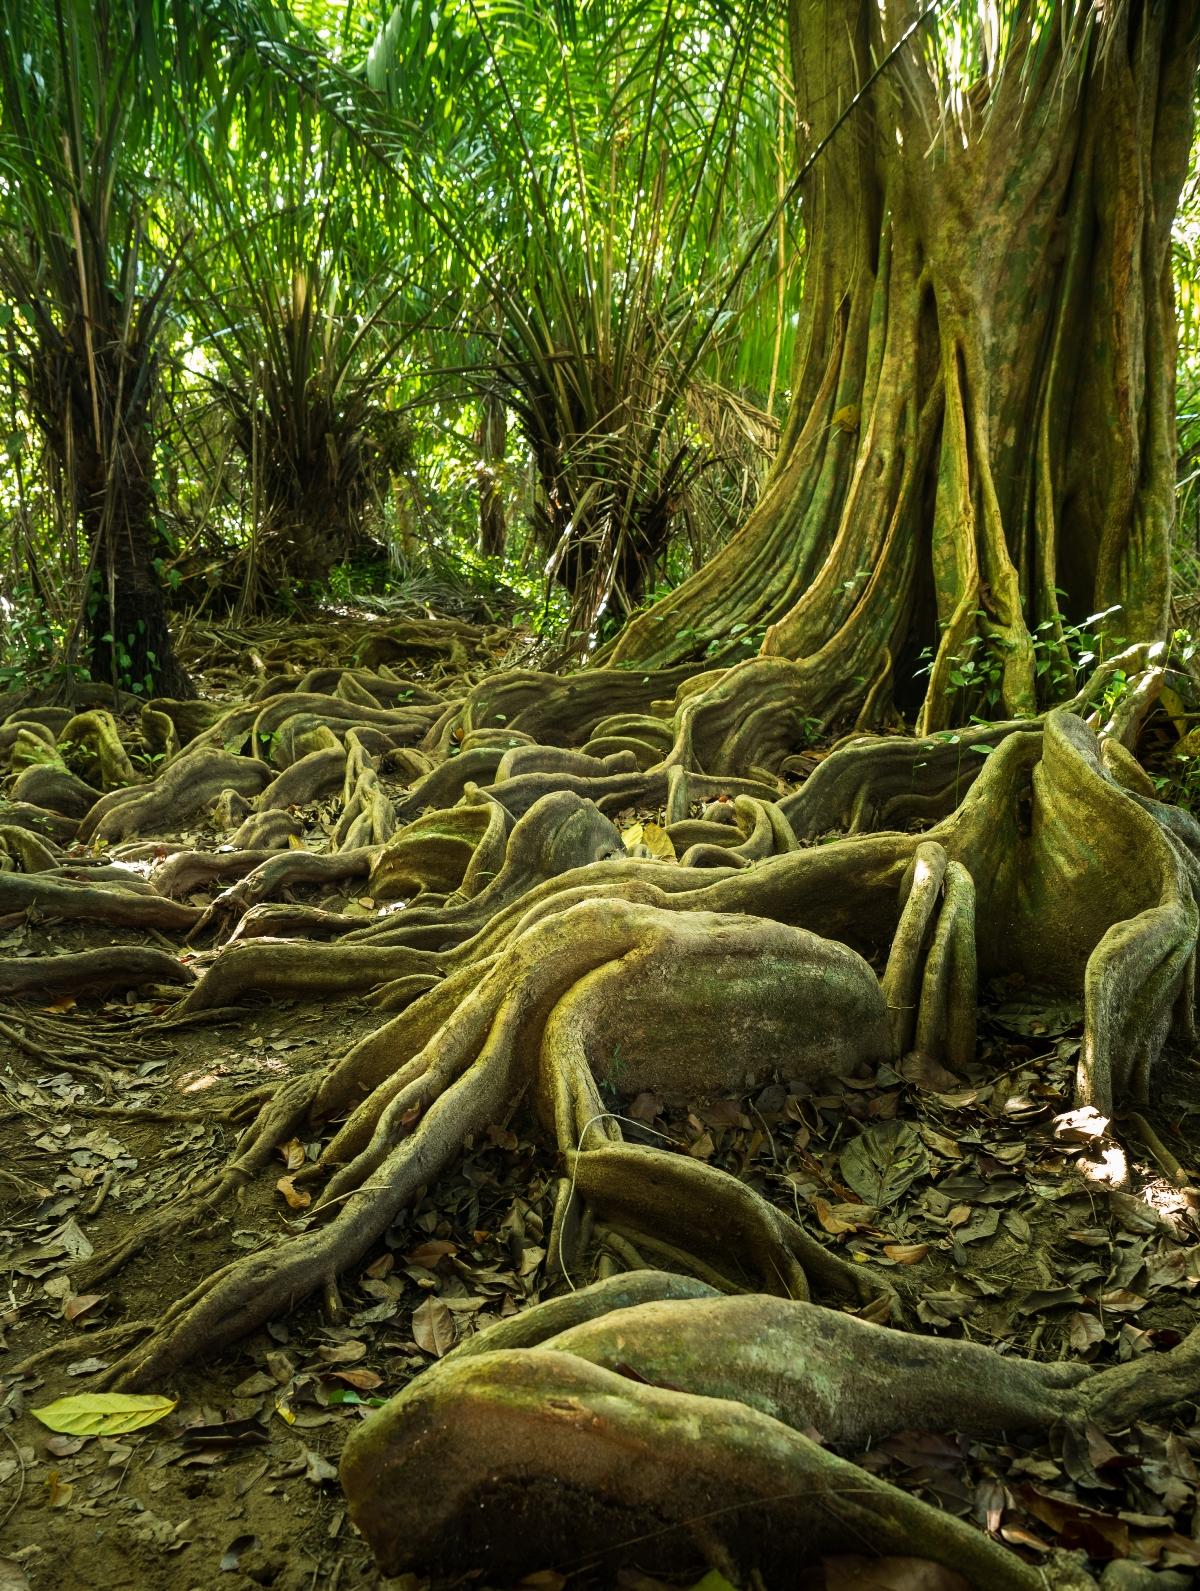 Costa Rica's jungle